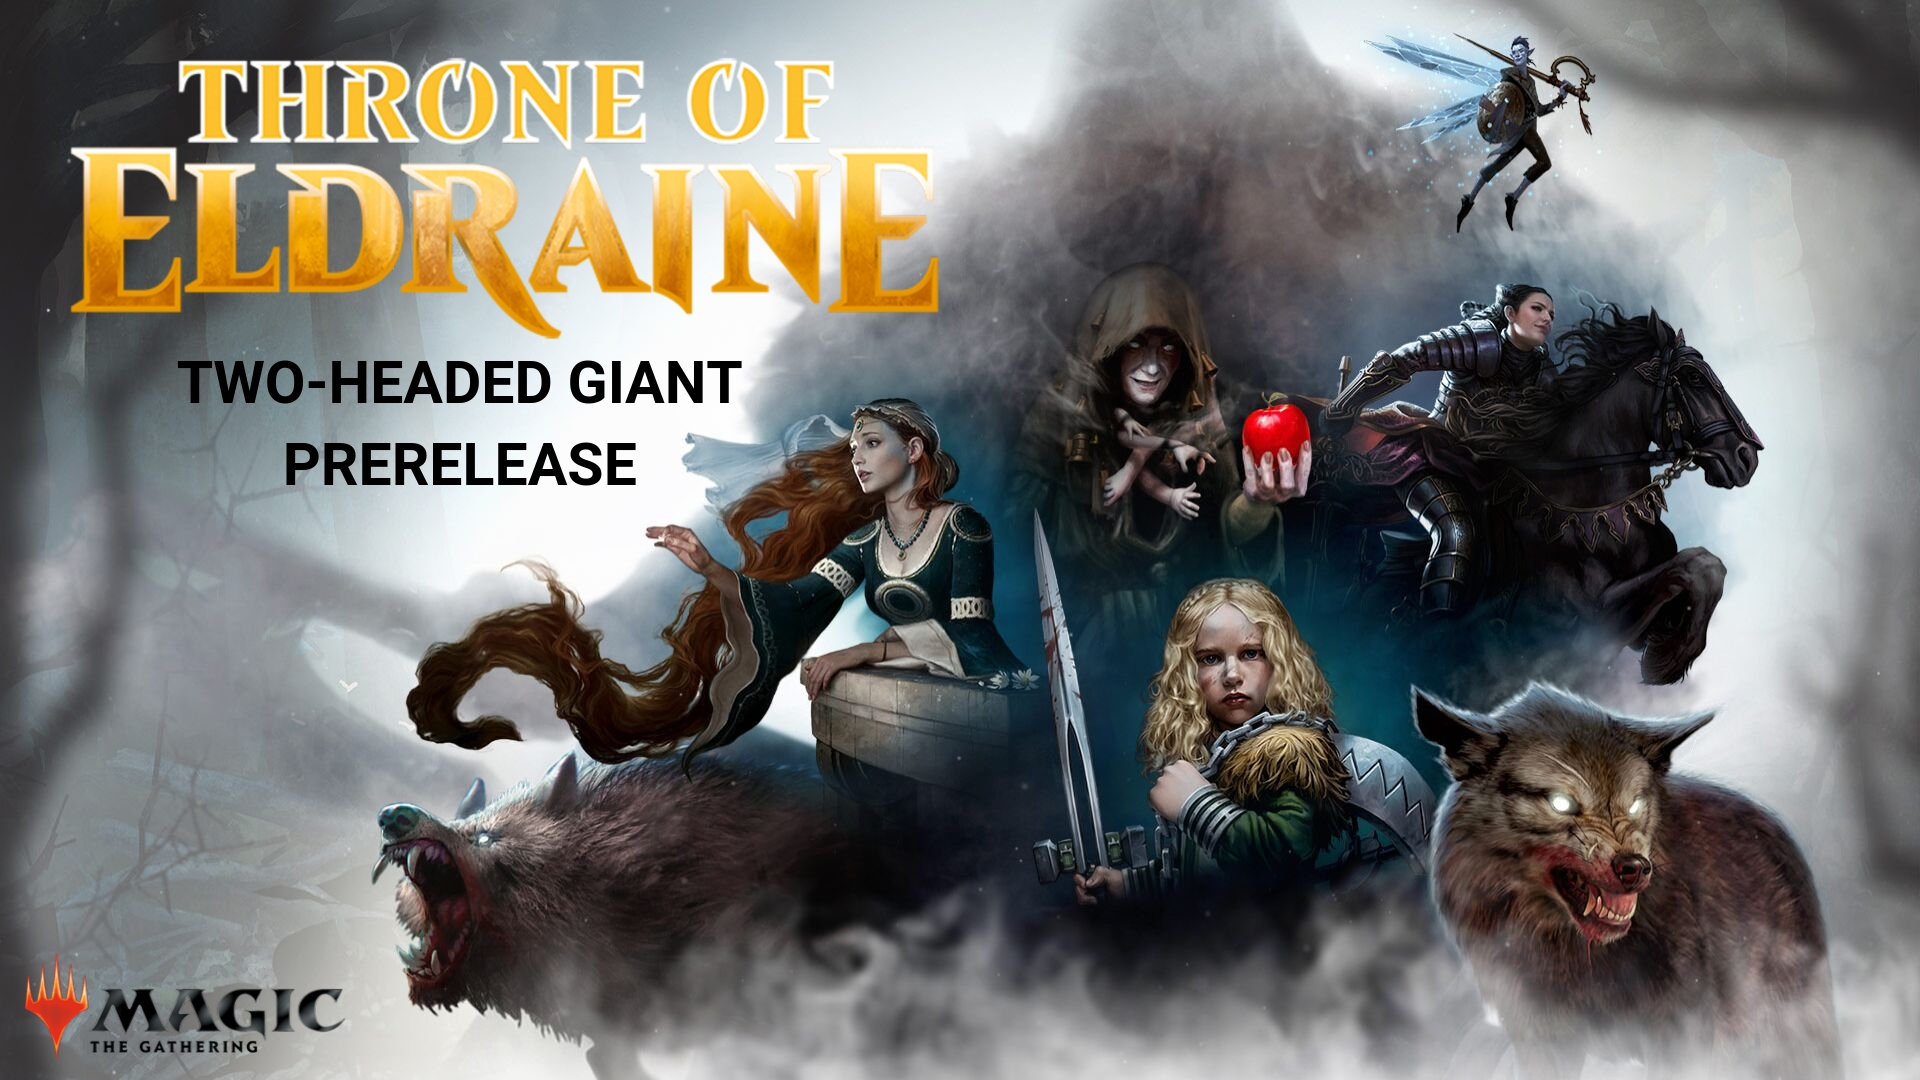 Mtg Throne Of Eldraine Two Headed Giant Prerelease Boardwalk